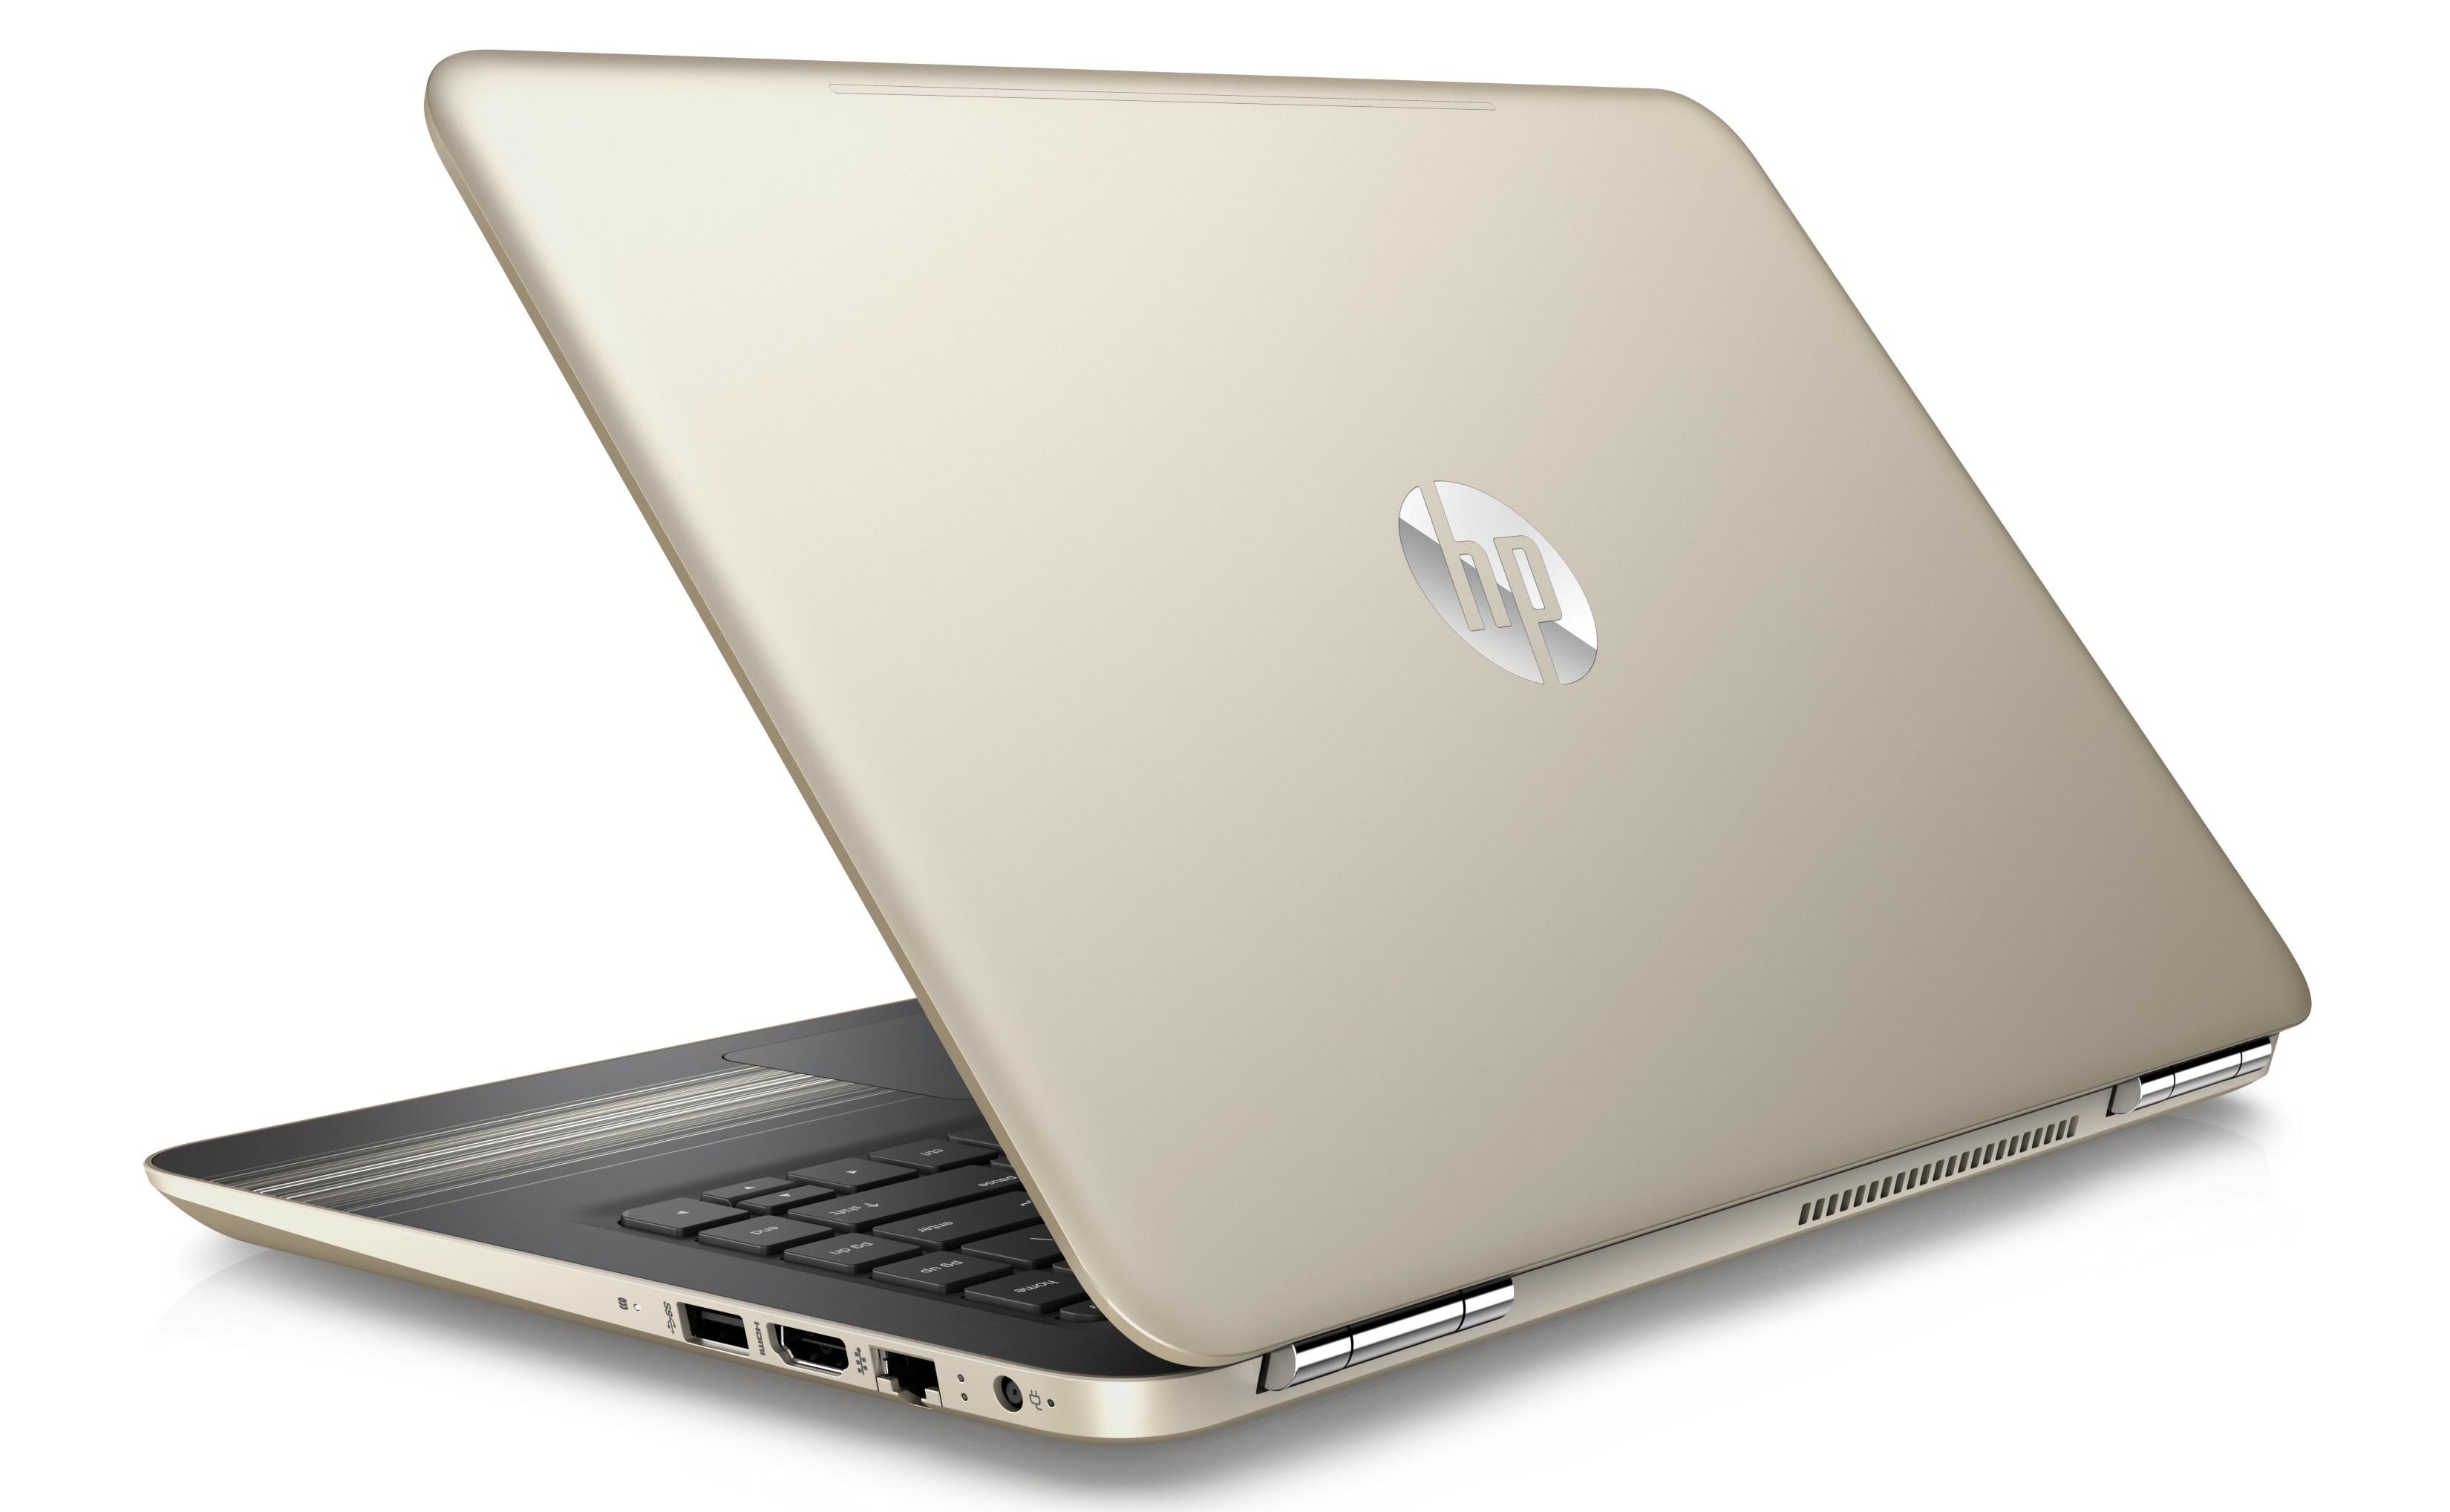 HP Pavilion 14 AL061NR 14 Laptop Intel Core I3 6100U 2